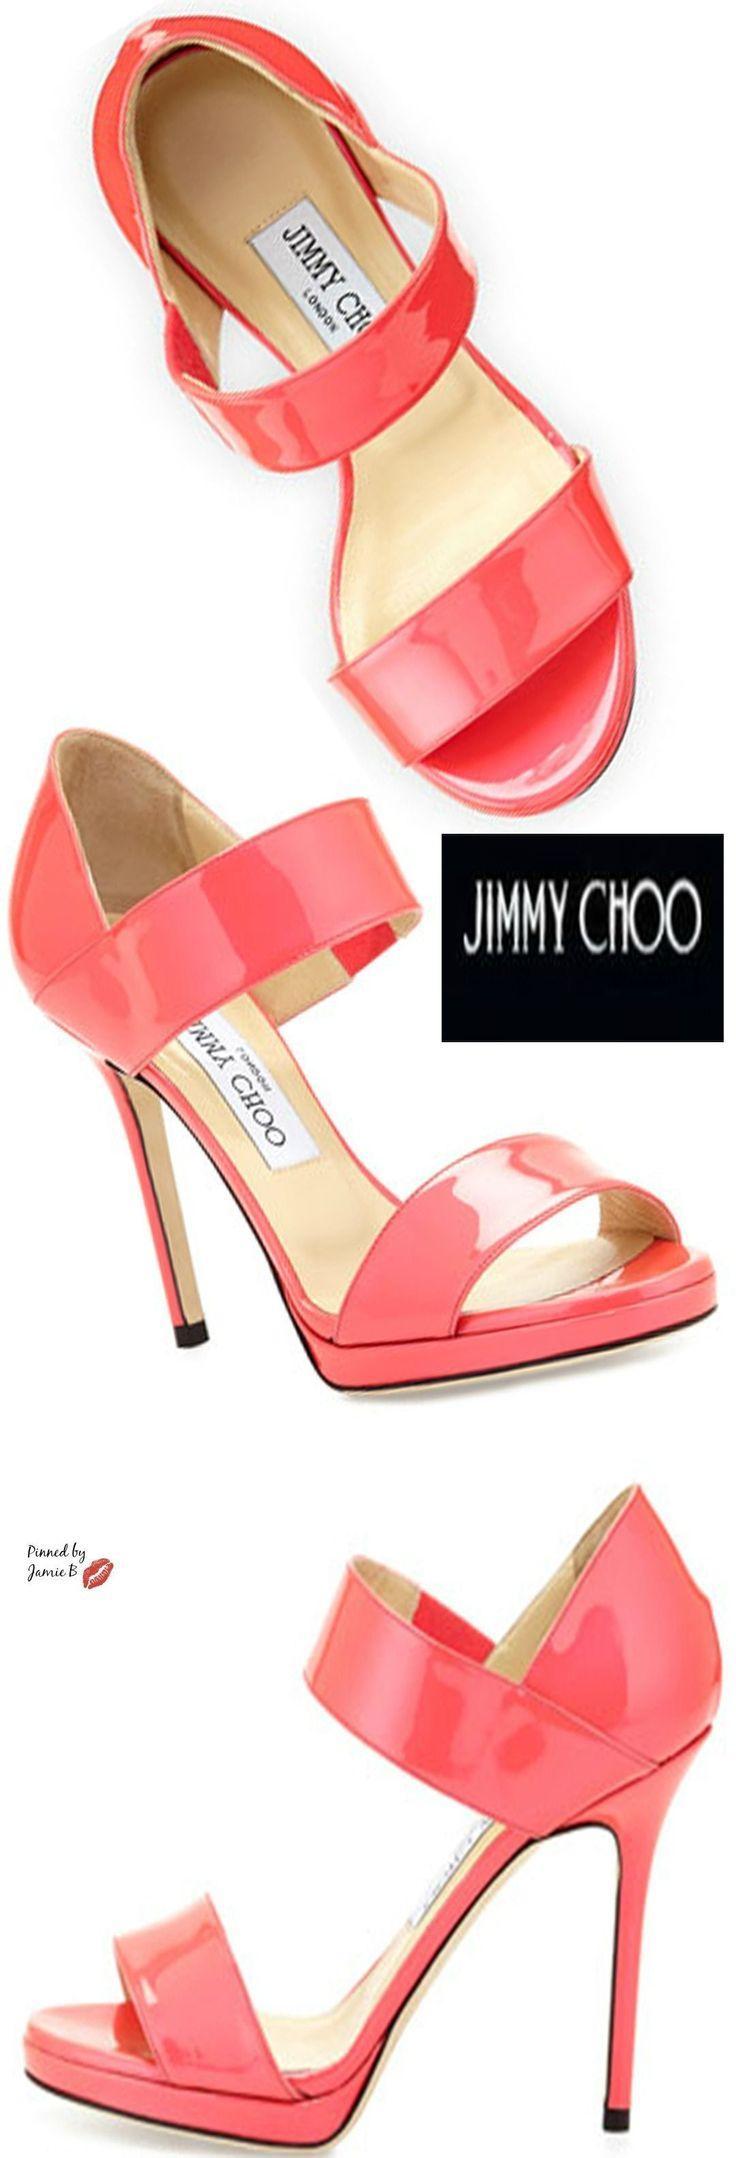 Jimmy Choo | Alana Patent Double-Band Sandal | Jamie B #jimmychooflats #jimmychooheelsstrappy